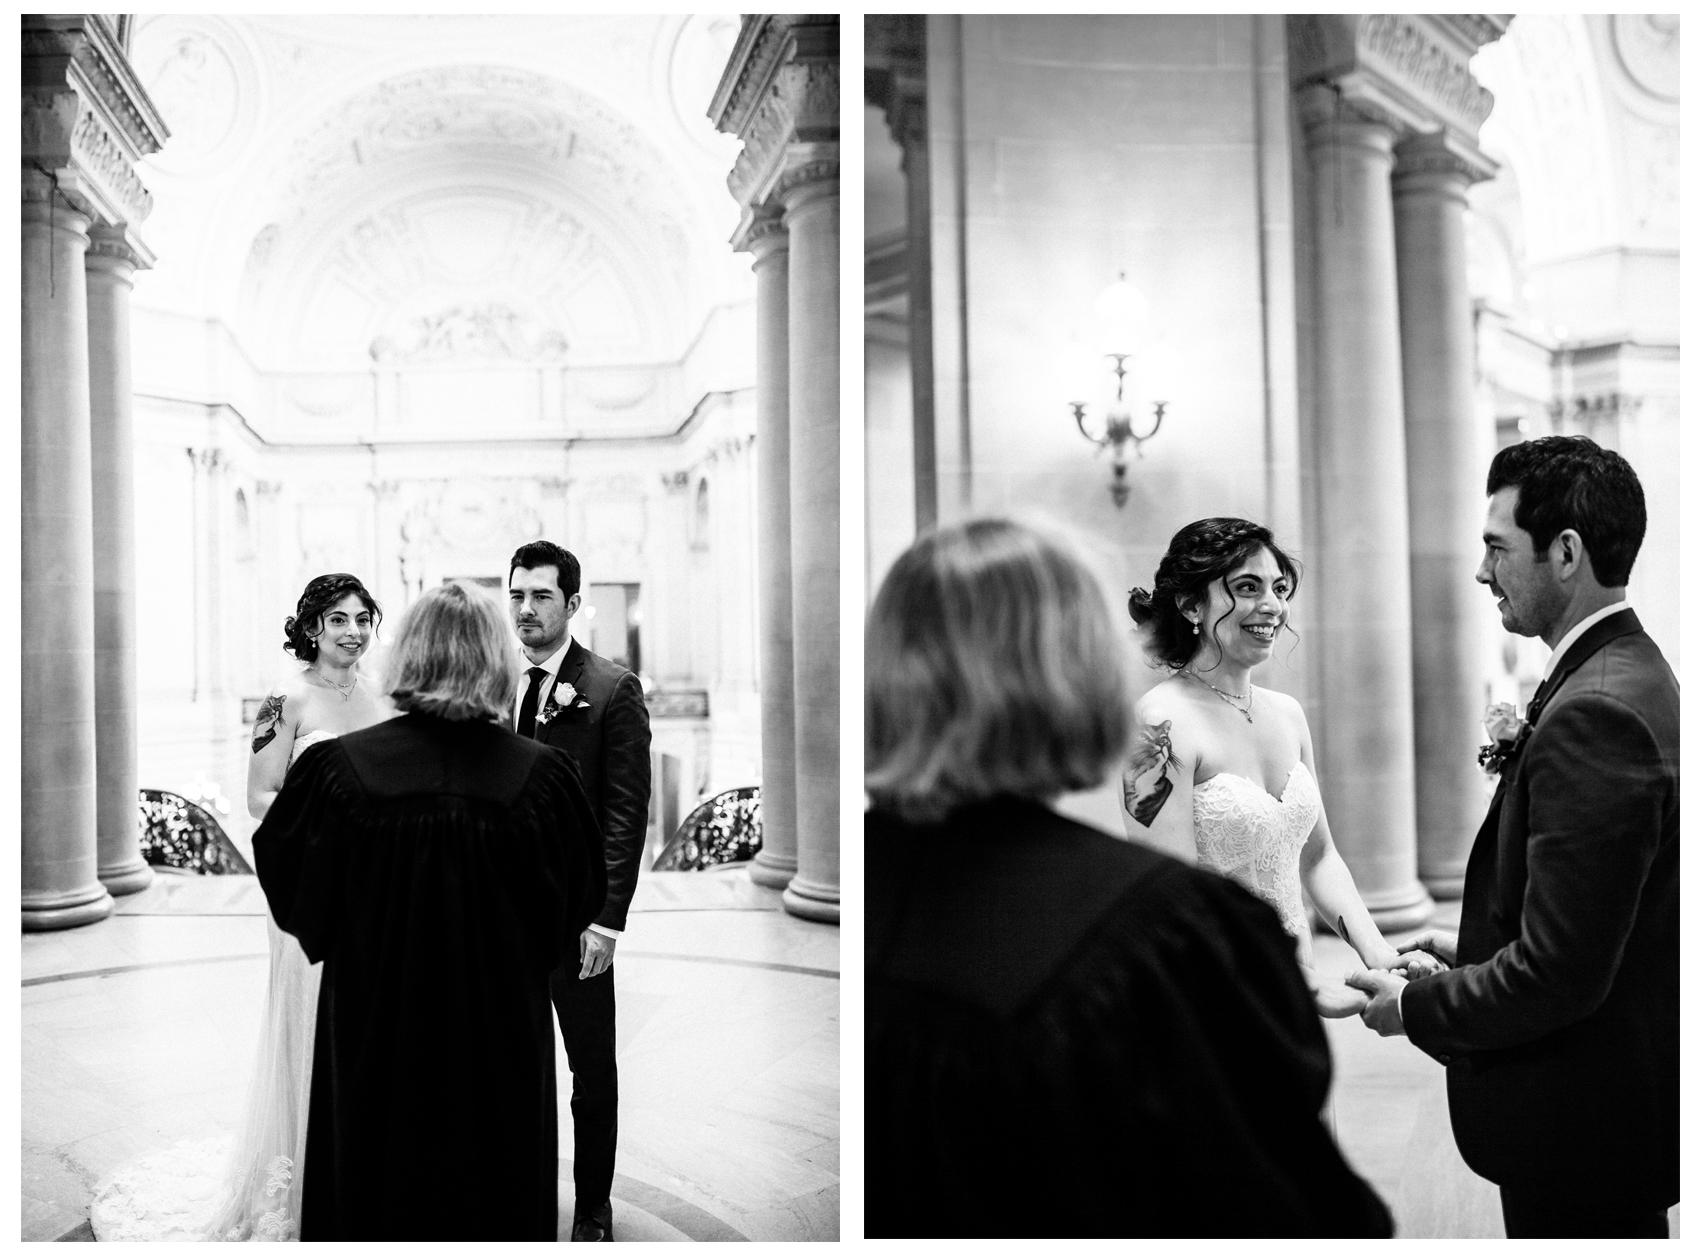 San Francisco City Hall & Stable Cafe Wedding Photography Double 4.jpg